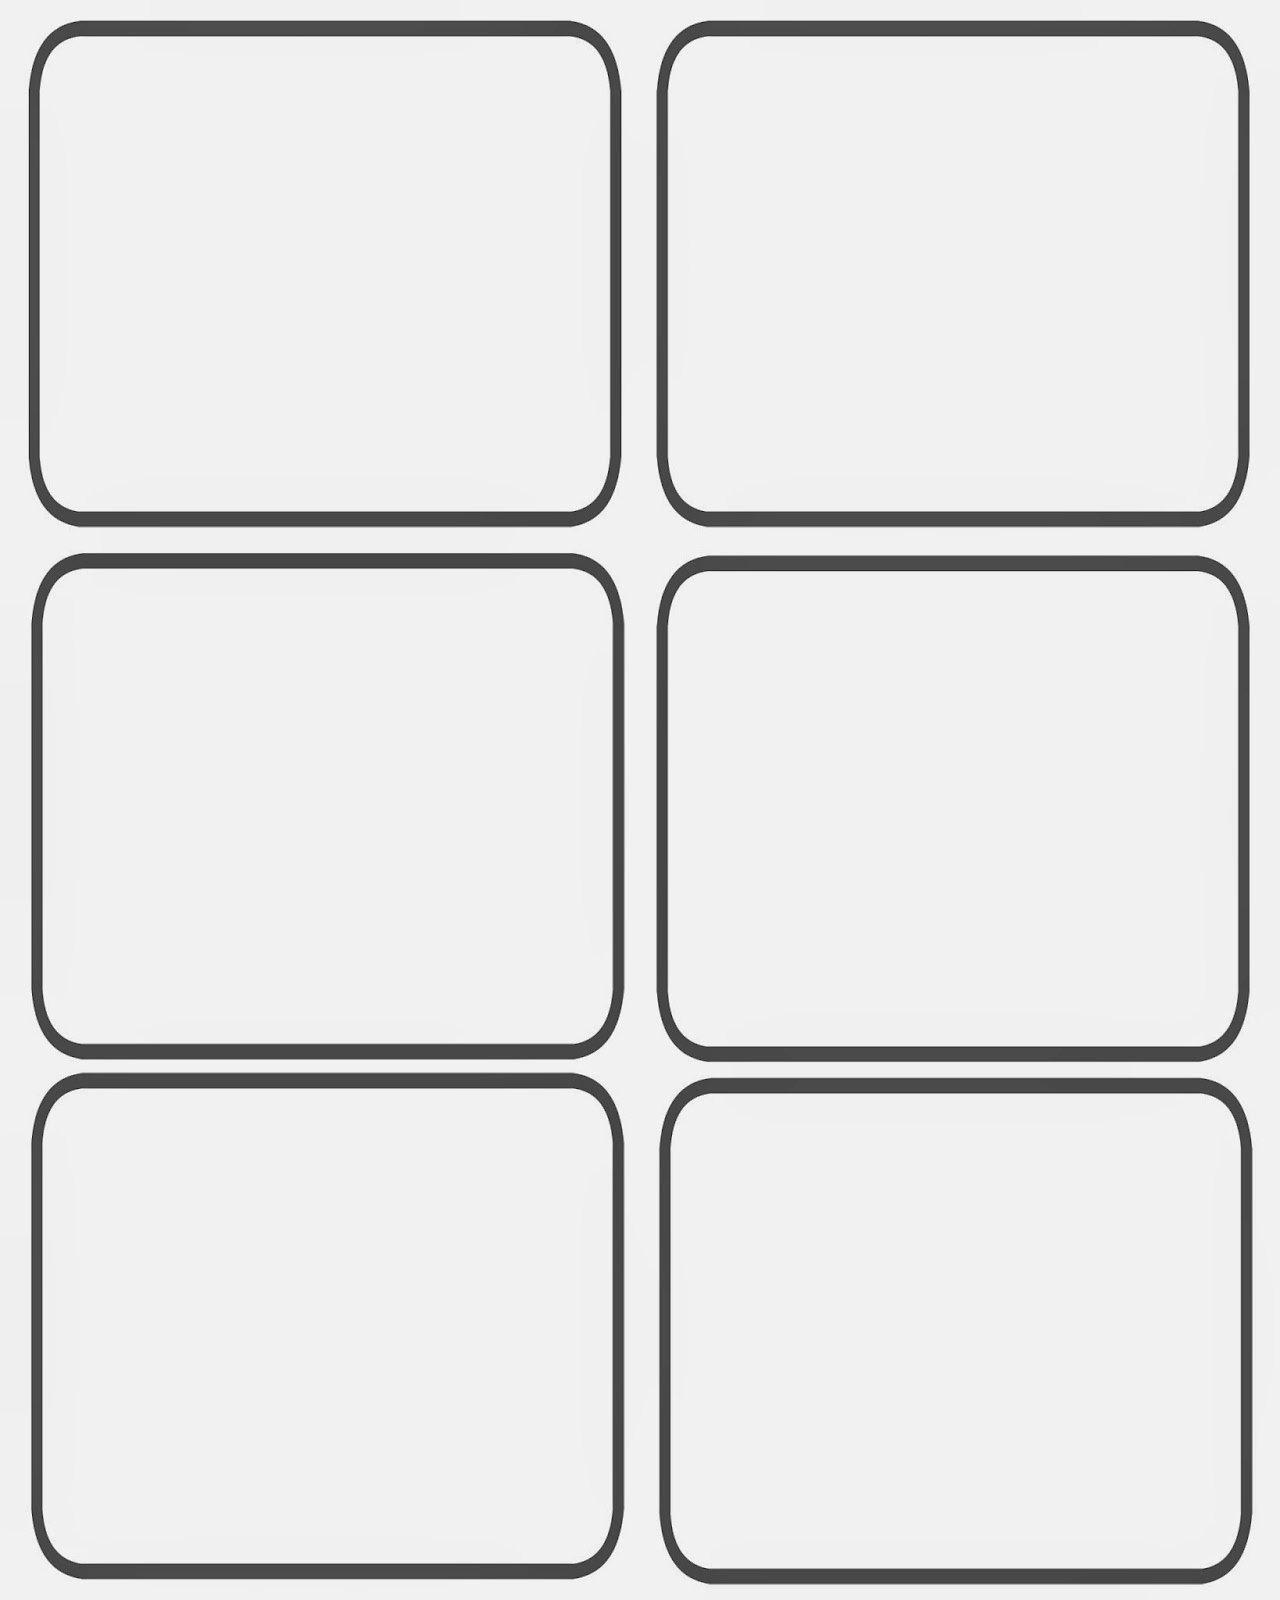 Blank Game Card Template Best Of Restlessrisa Free Printable Valentine Game